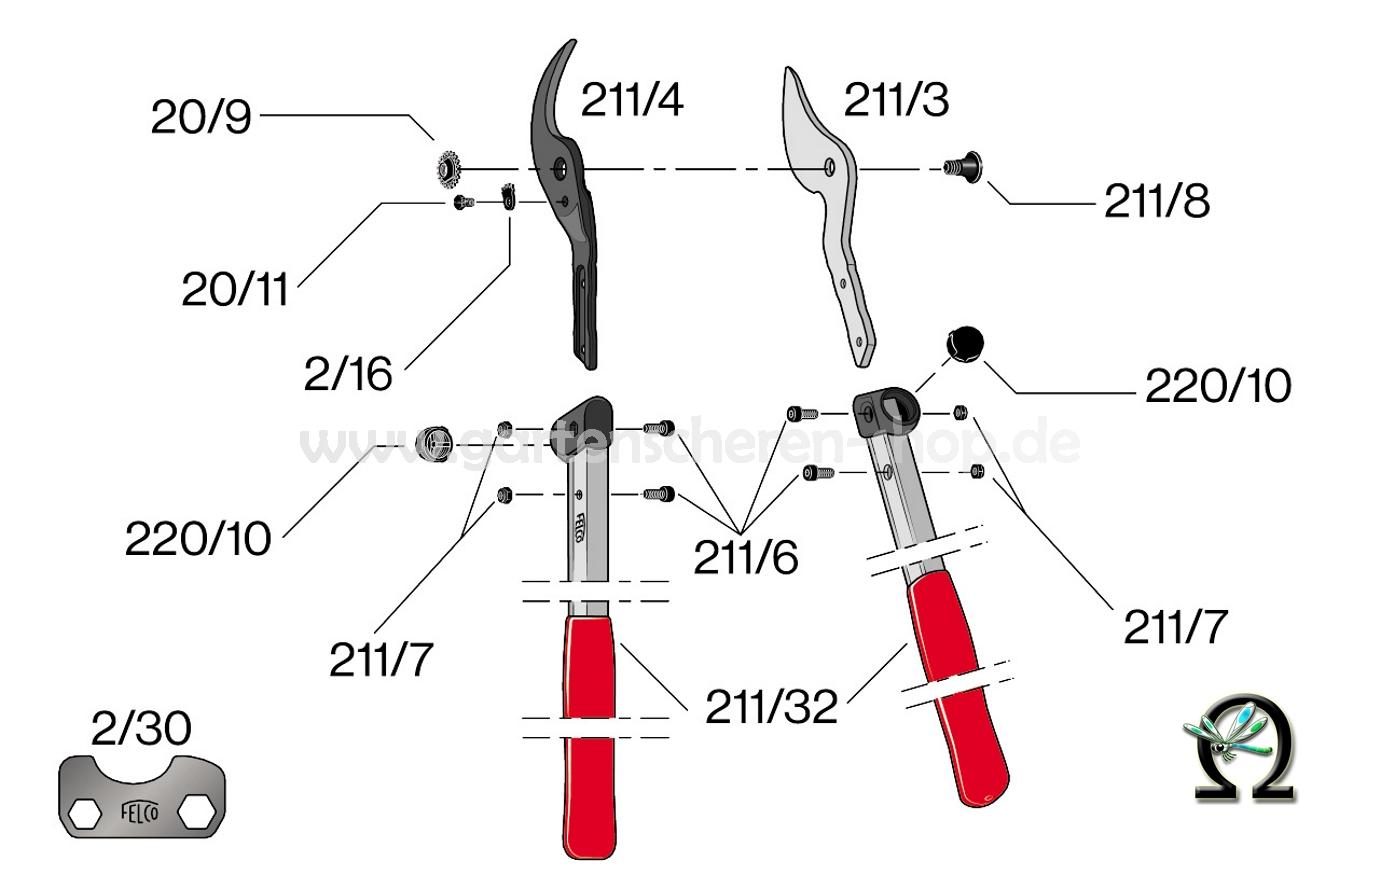 felco-211-50-explosionszeichnung